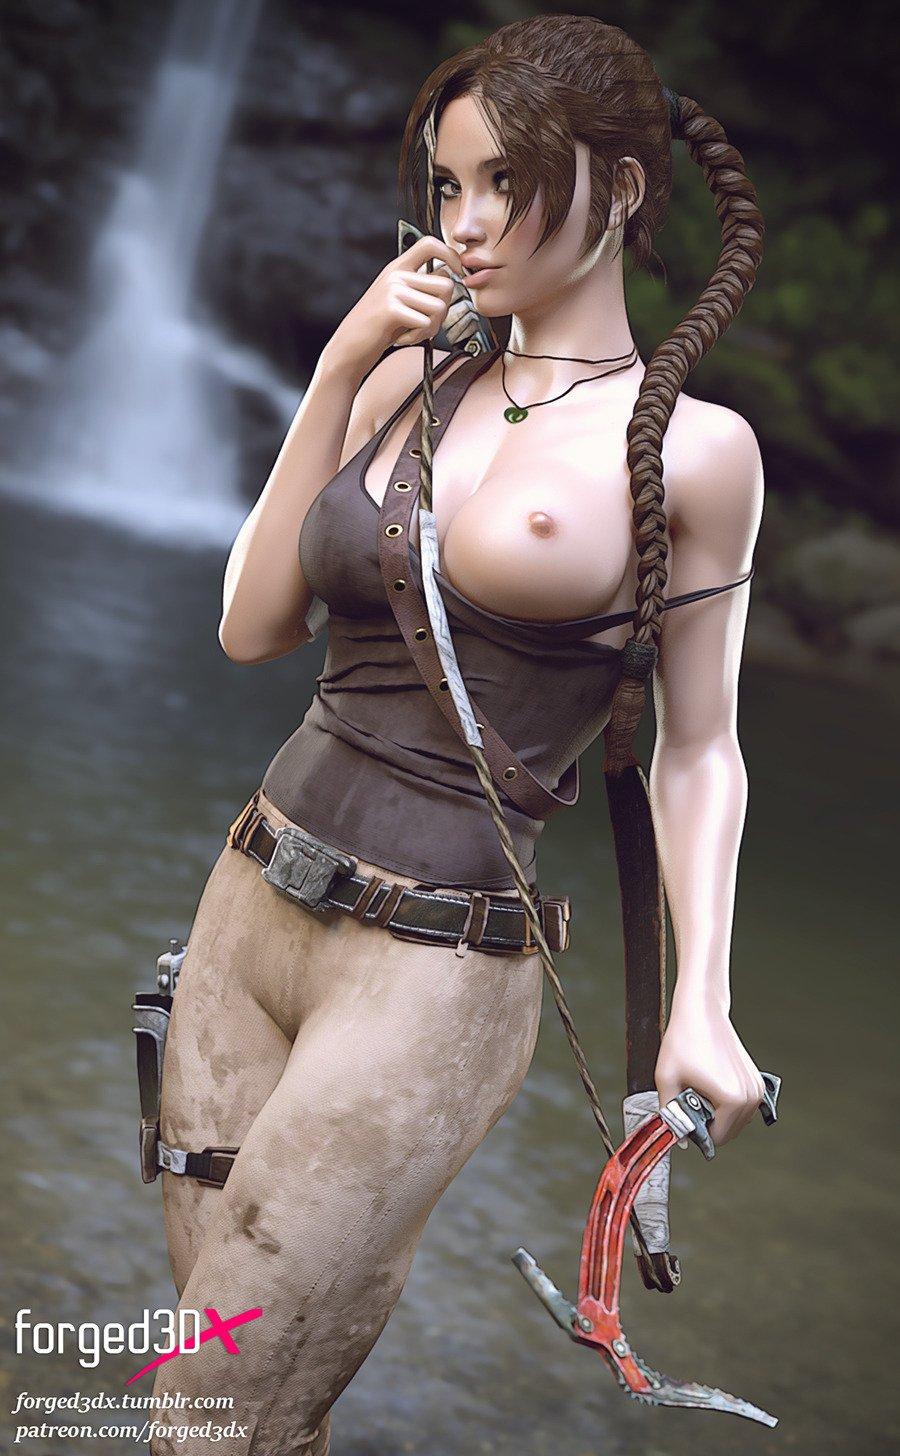 lara adventurer forged3dx affect3d com